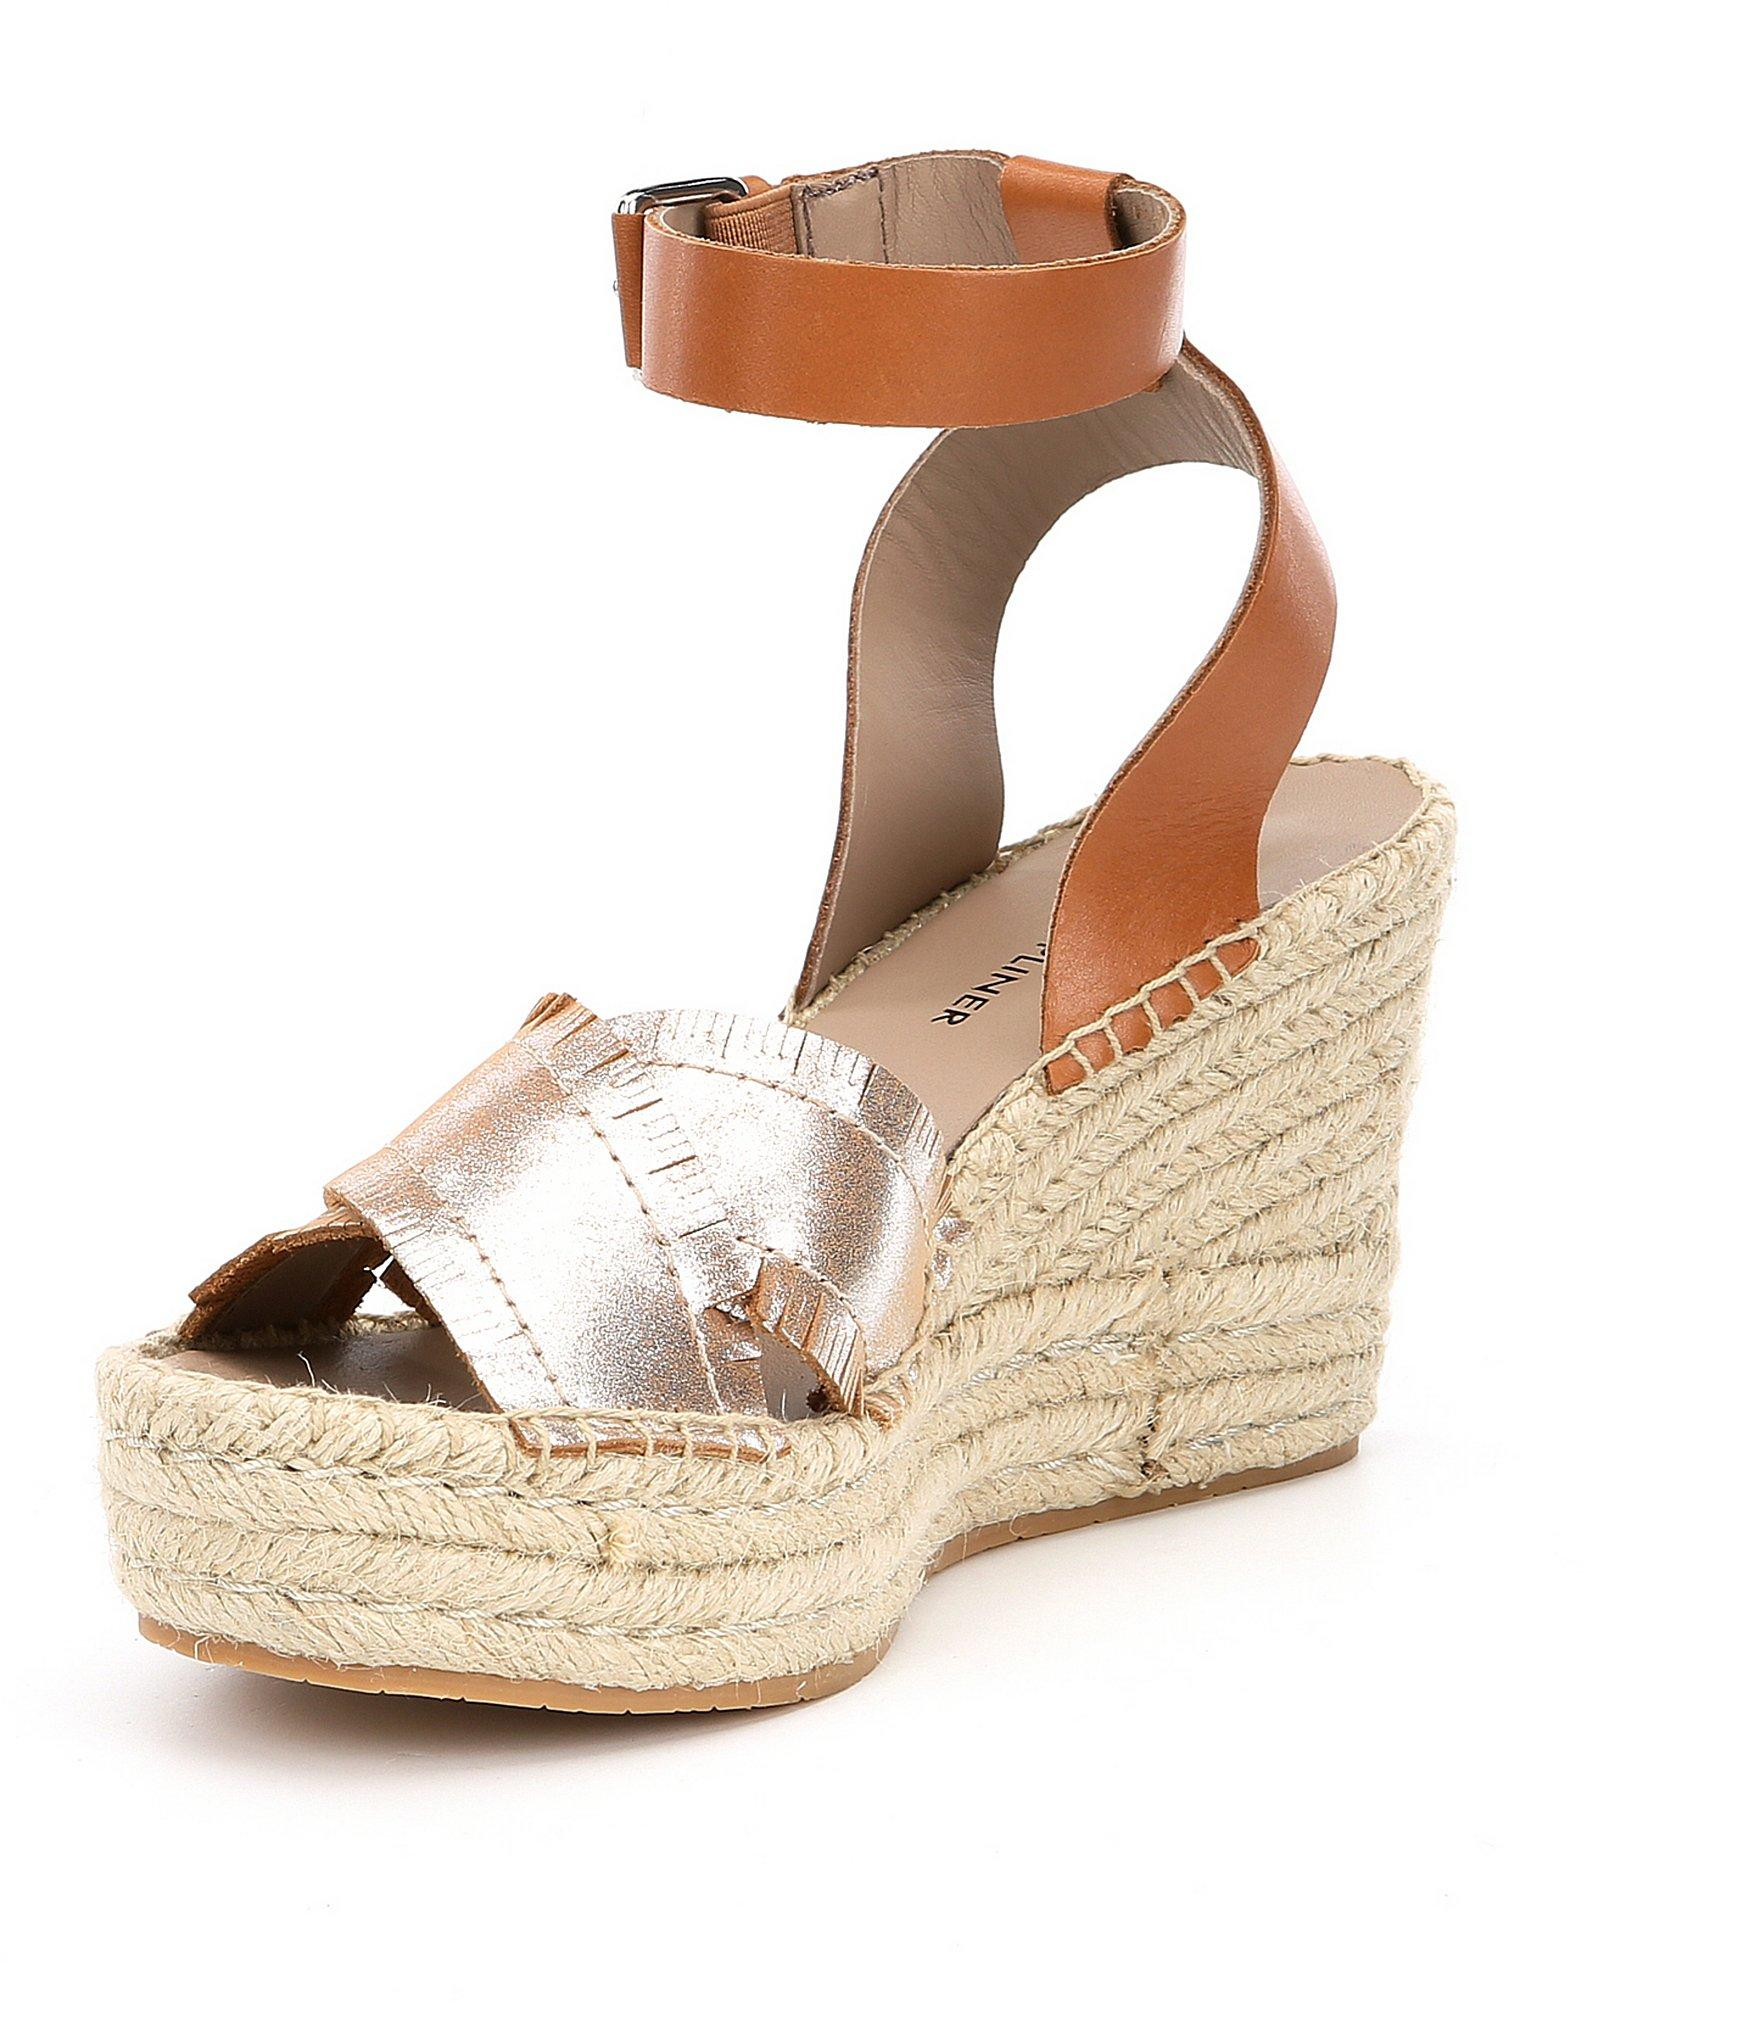 fe69cfa1d5 Donald J Pliner - Metallic Ines Espadrille Wedge Sandals - Lyst. View  fullscreen